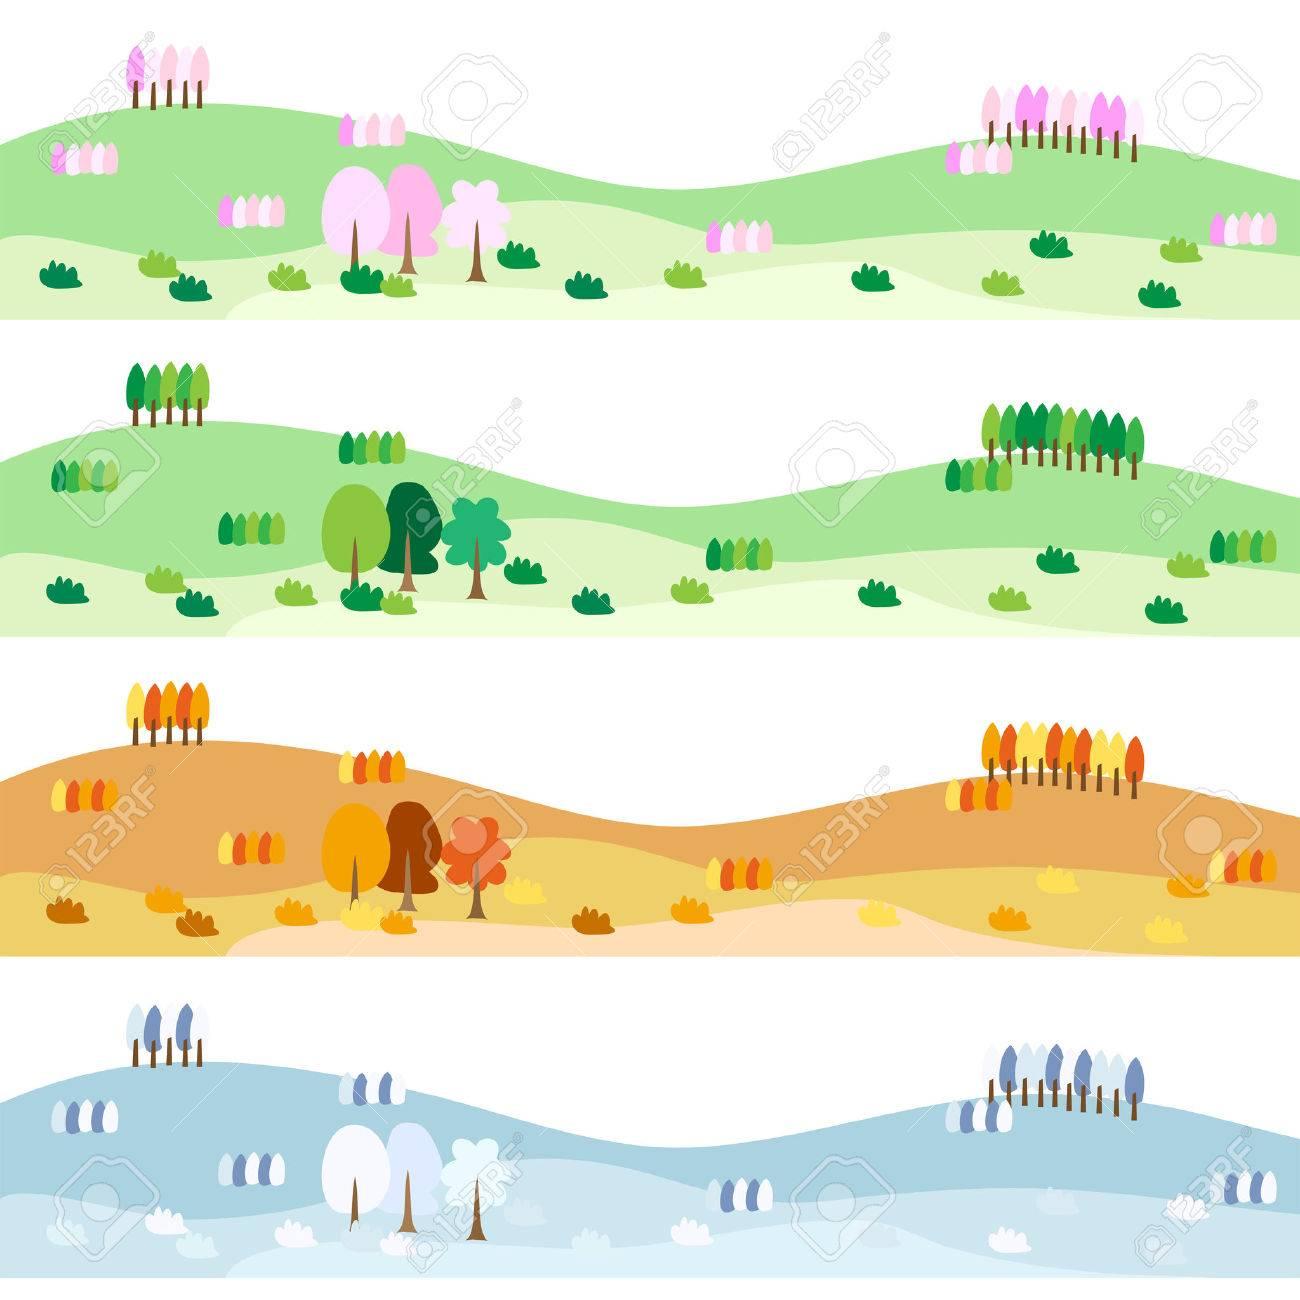 Four seasons of landscape illustrations - 40234730